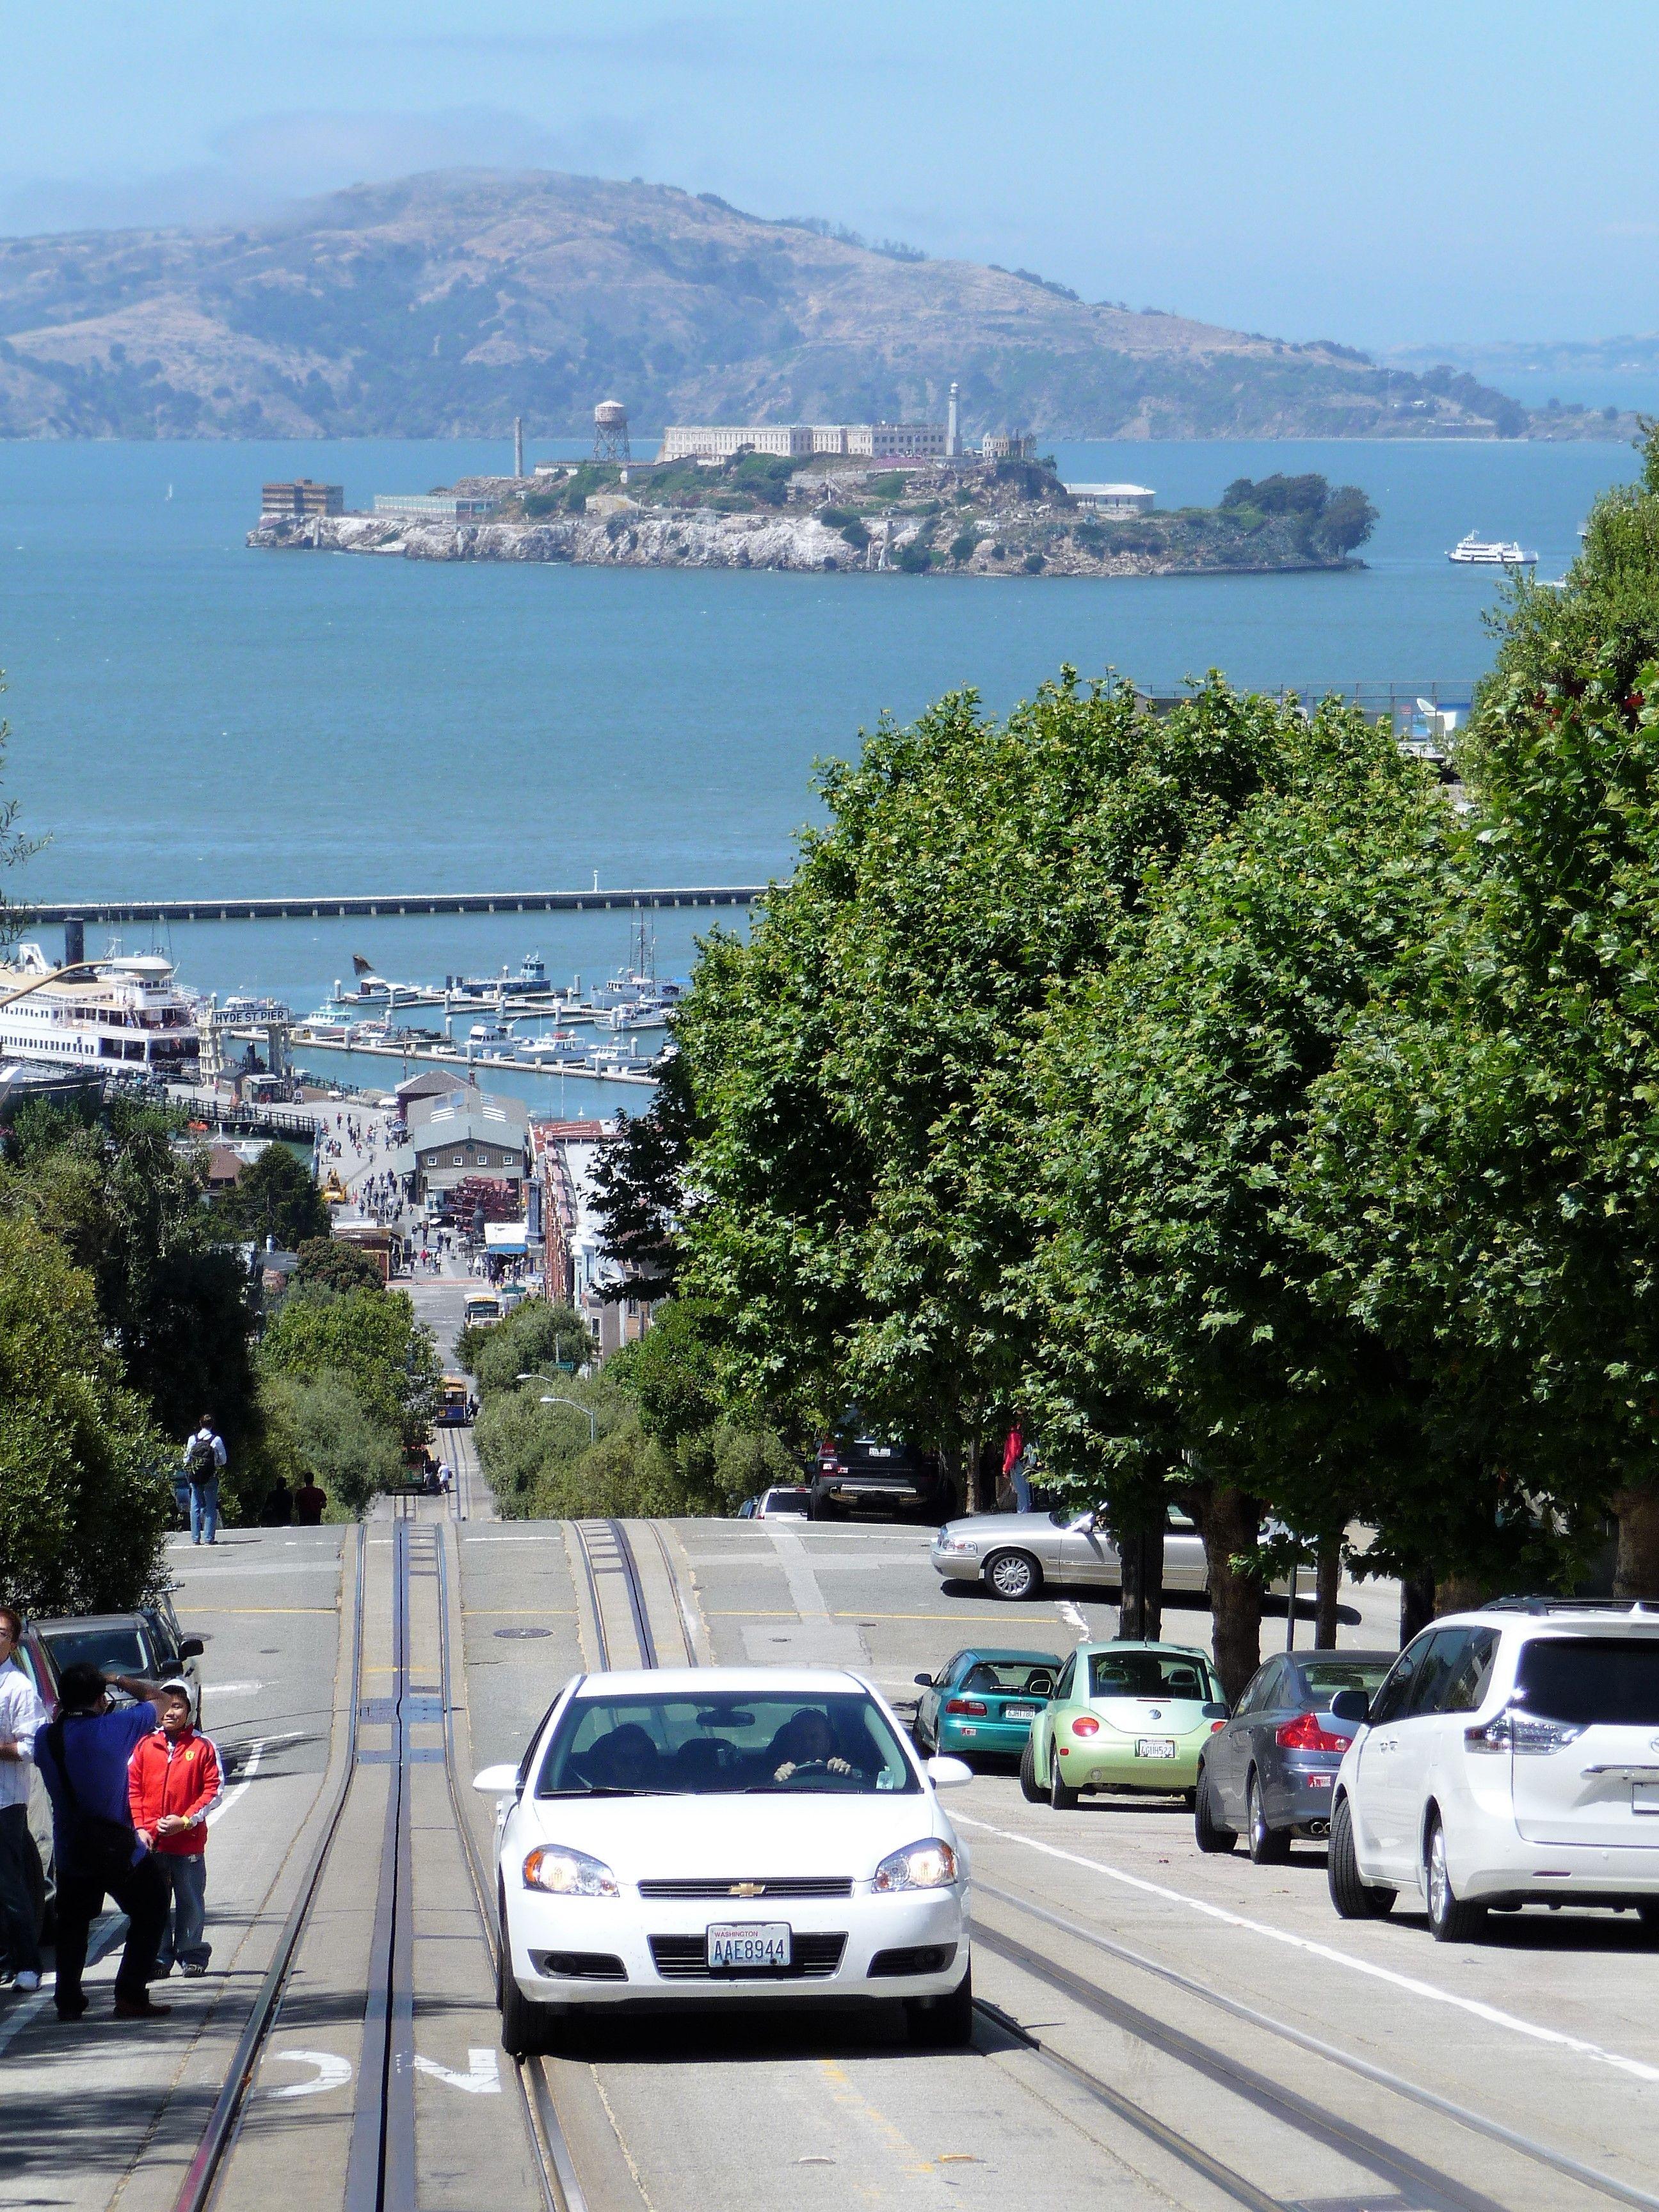 La prison d'Alcatraz juste en face ! Agence de Voyages @leclercblagnac